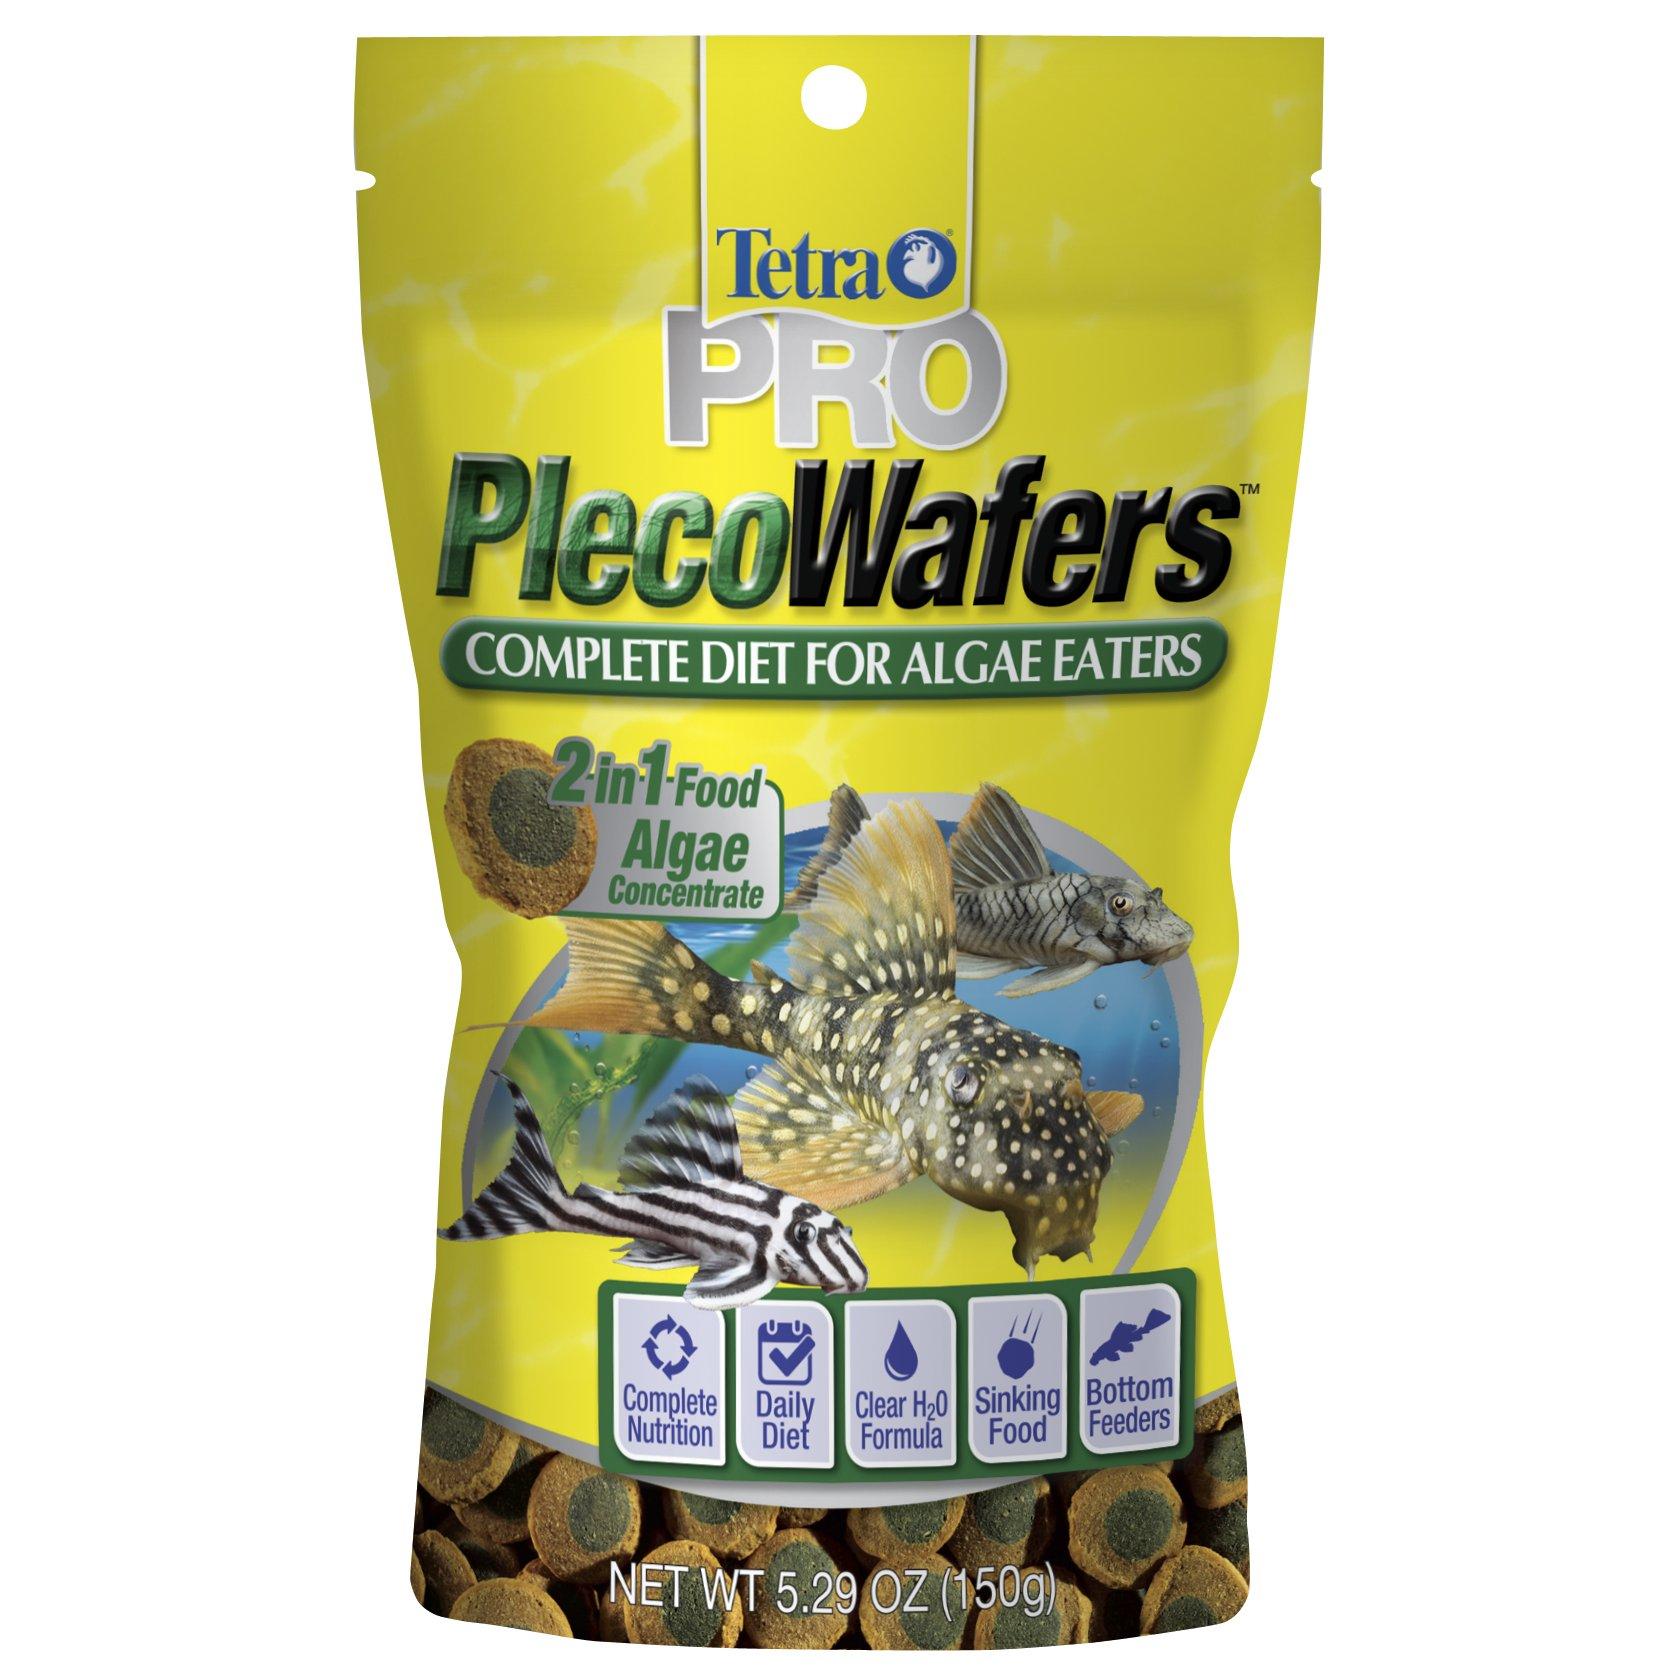 Tetra PRO PlecoWafers for Algae Eaters, 5.29-Ounce